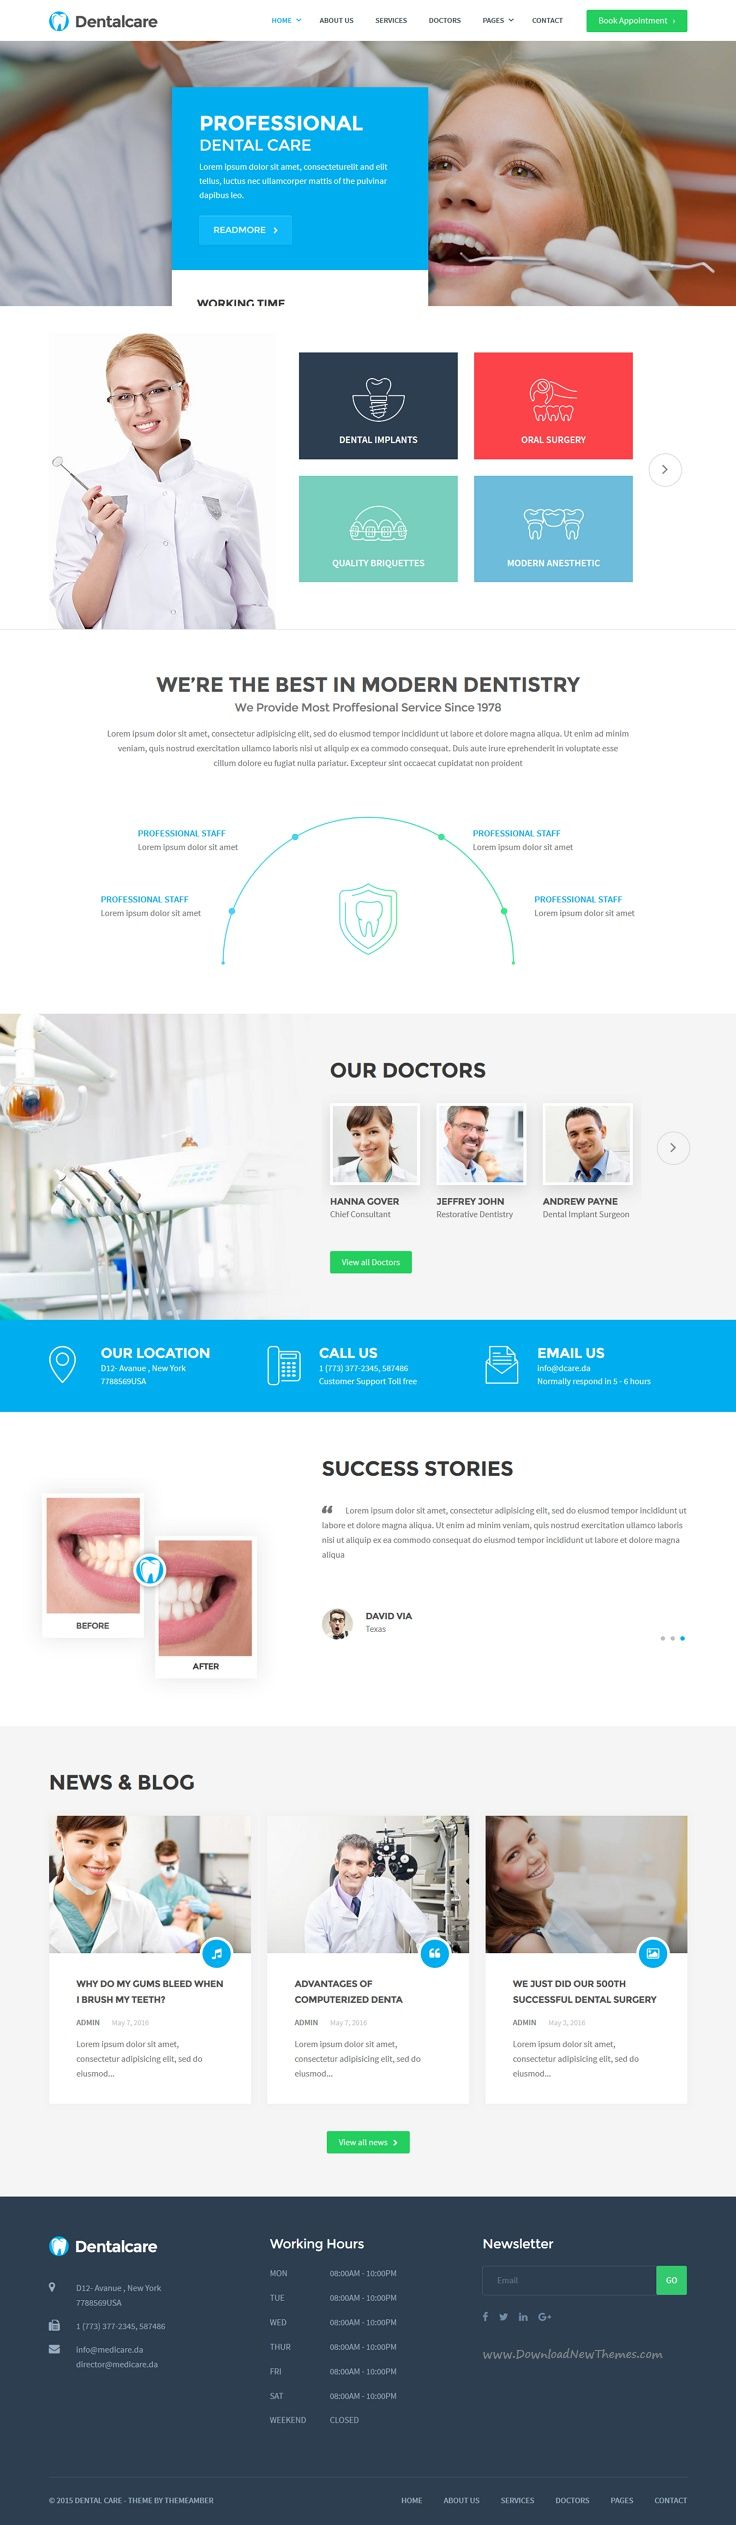 Dental Care : Medical - Dentist - Health Wordpress Theme